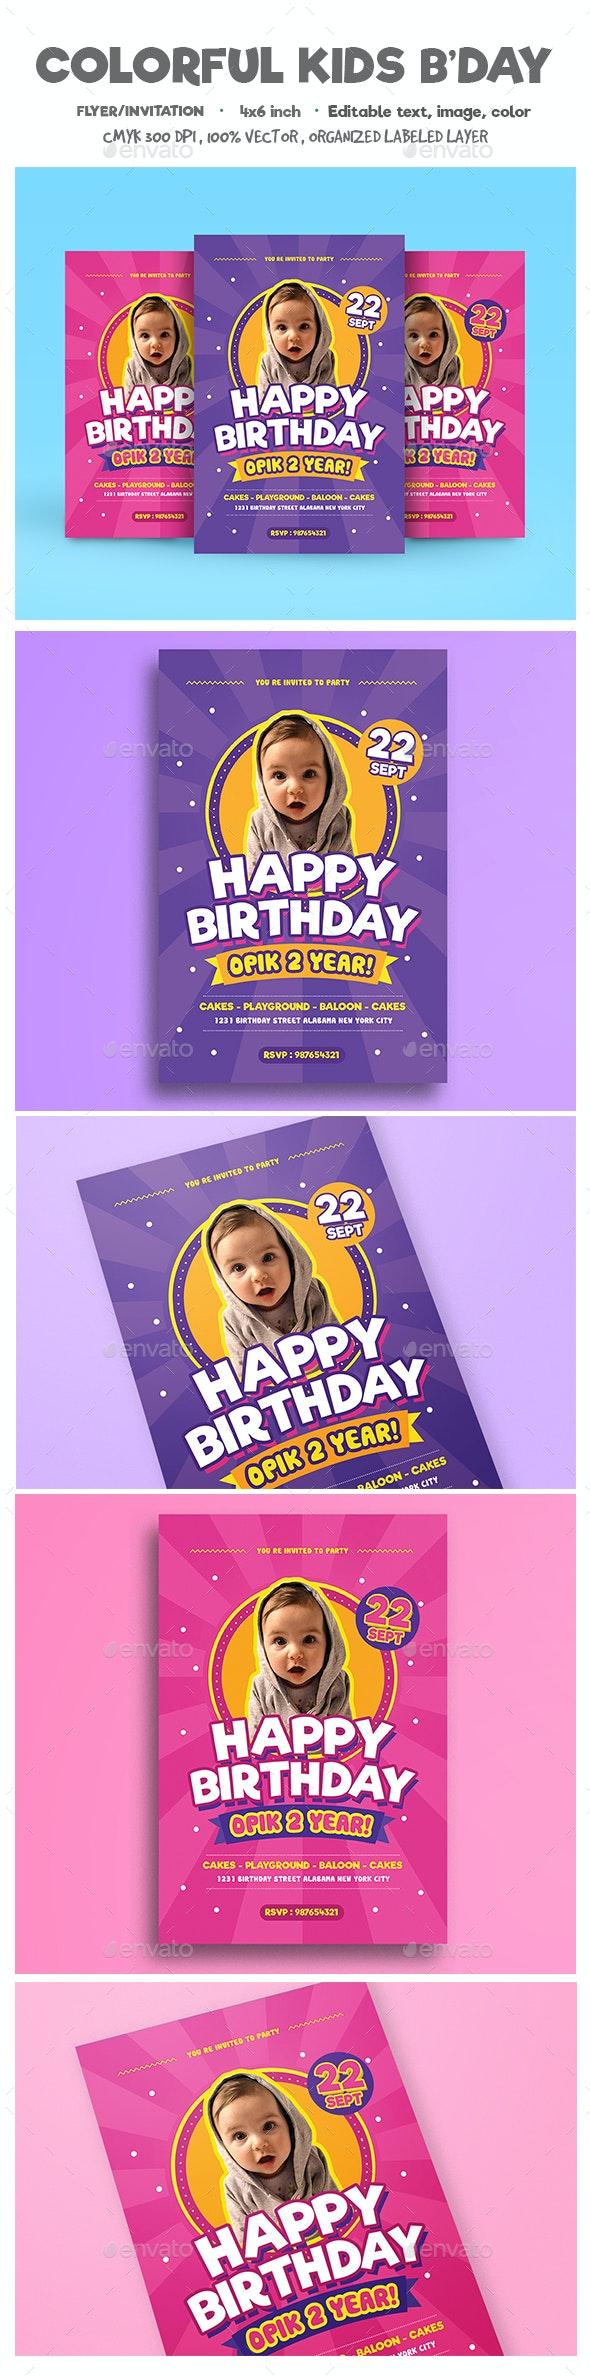 Colorful Kids Birthday Flyer/Invitation - Birthday Greeting Cards